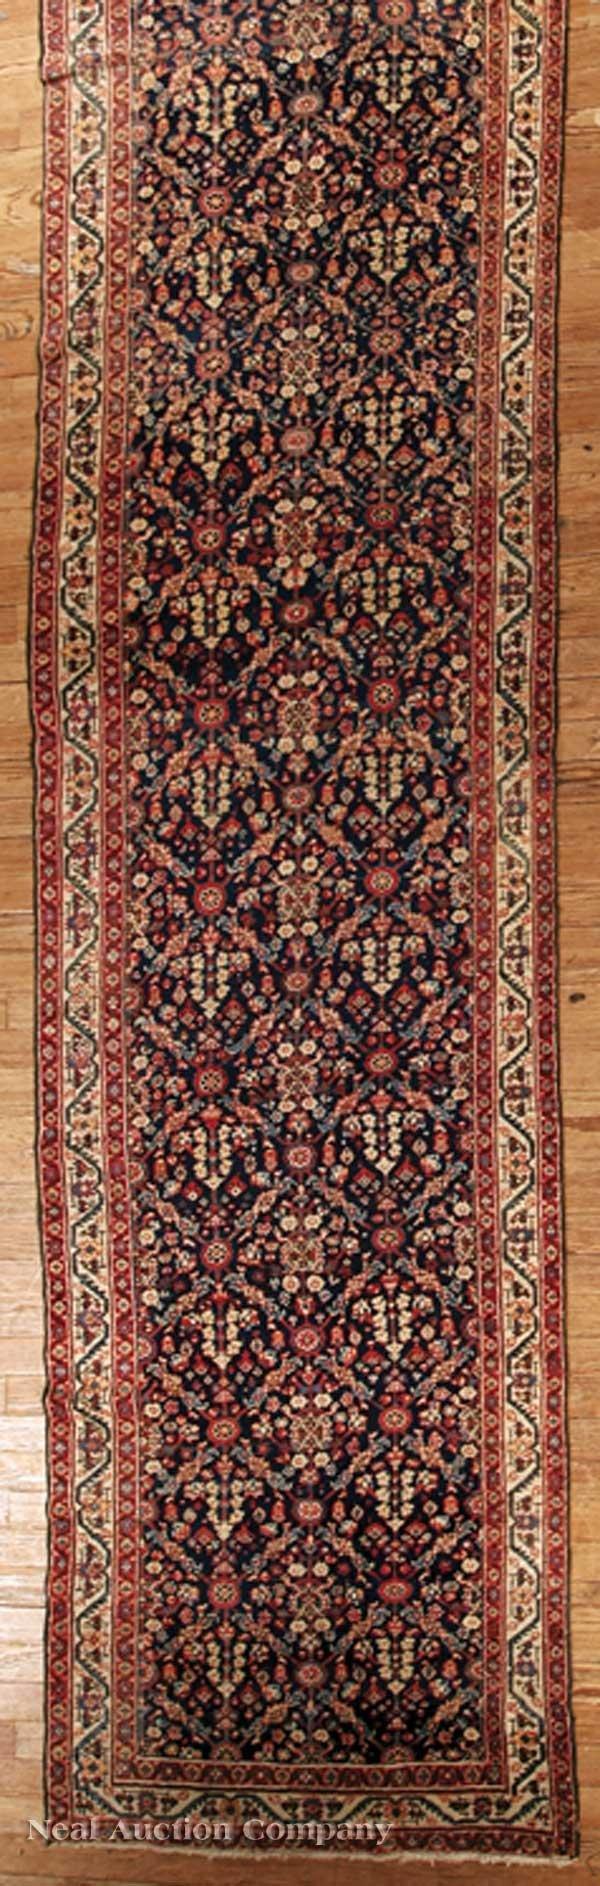 0629: Antique Persian Runner